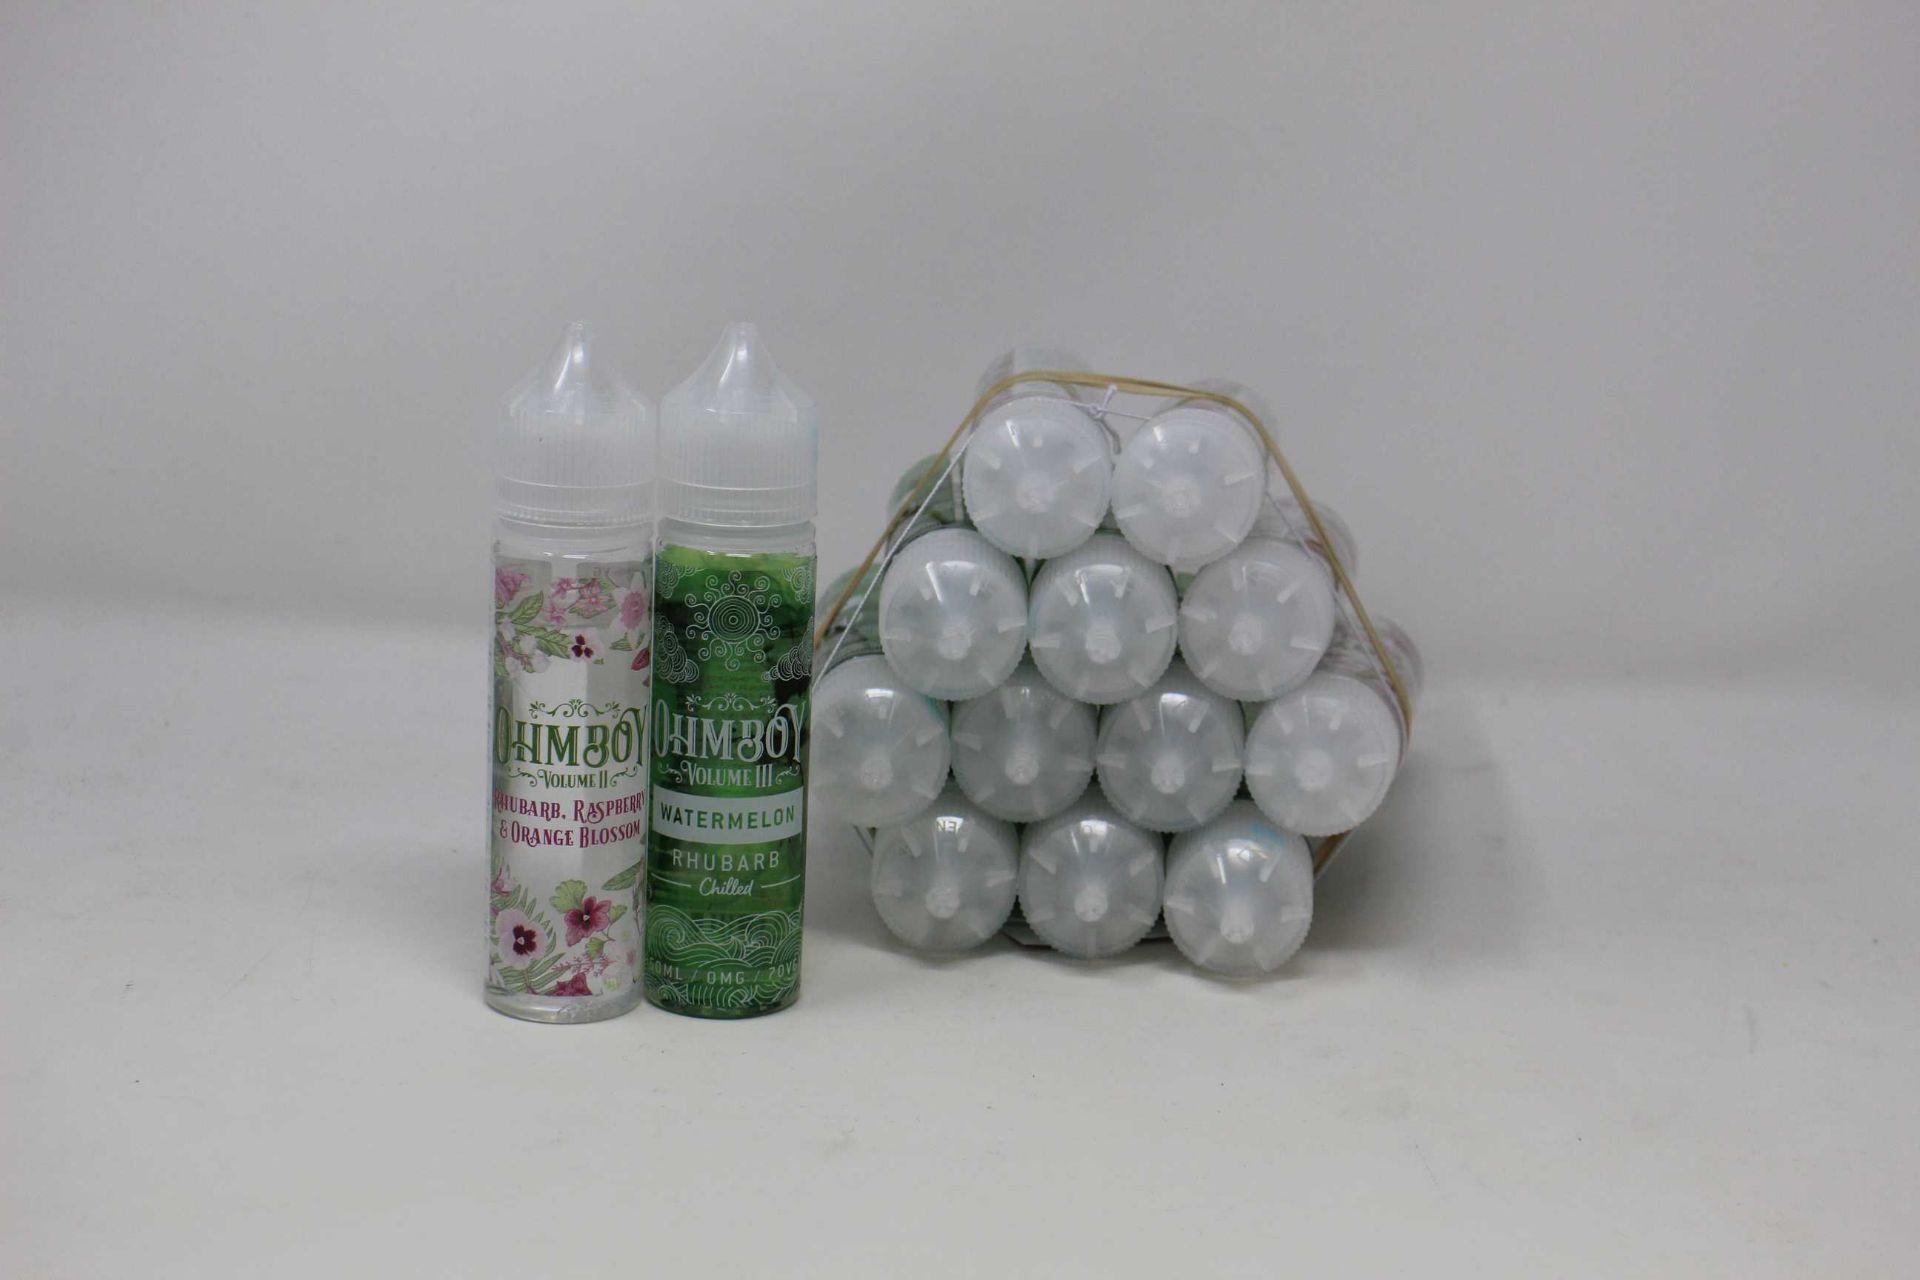 Five as new bottles of Ohm Boy Volume II Rhubarb, Raspberry & Orange Blossom Botanicals E-Liquid 0mg